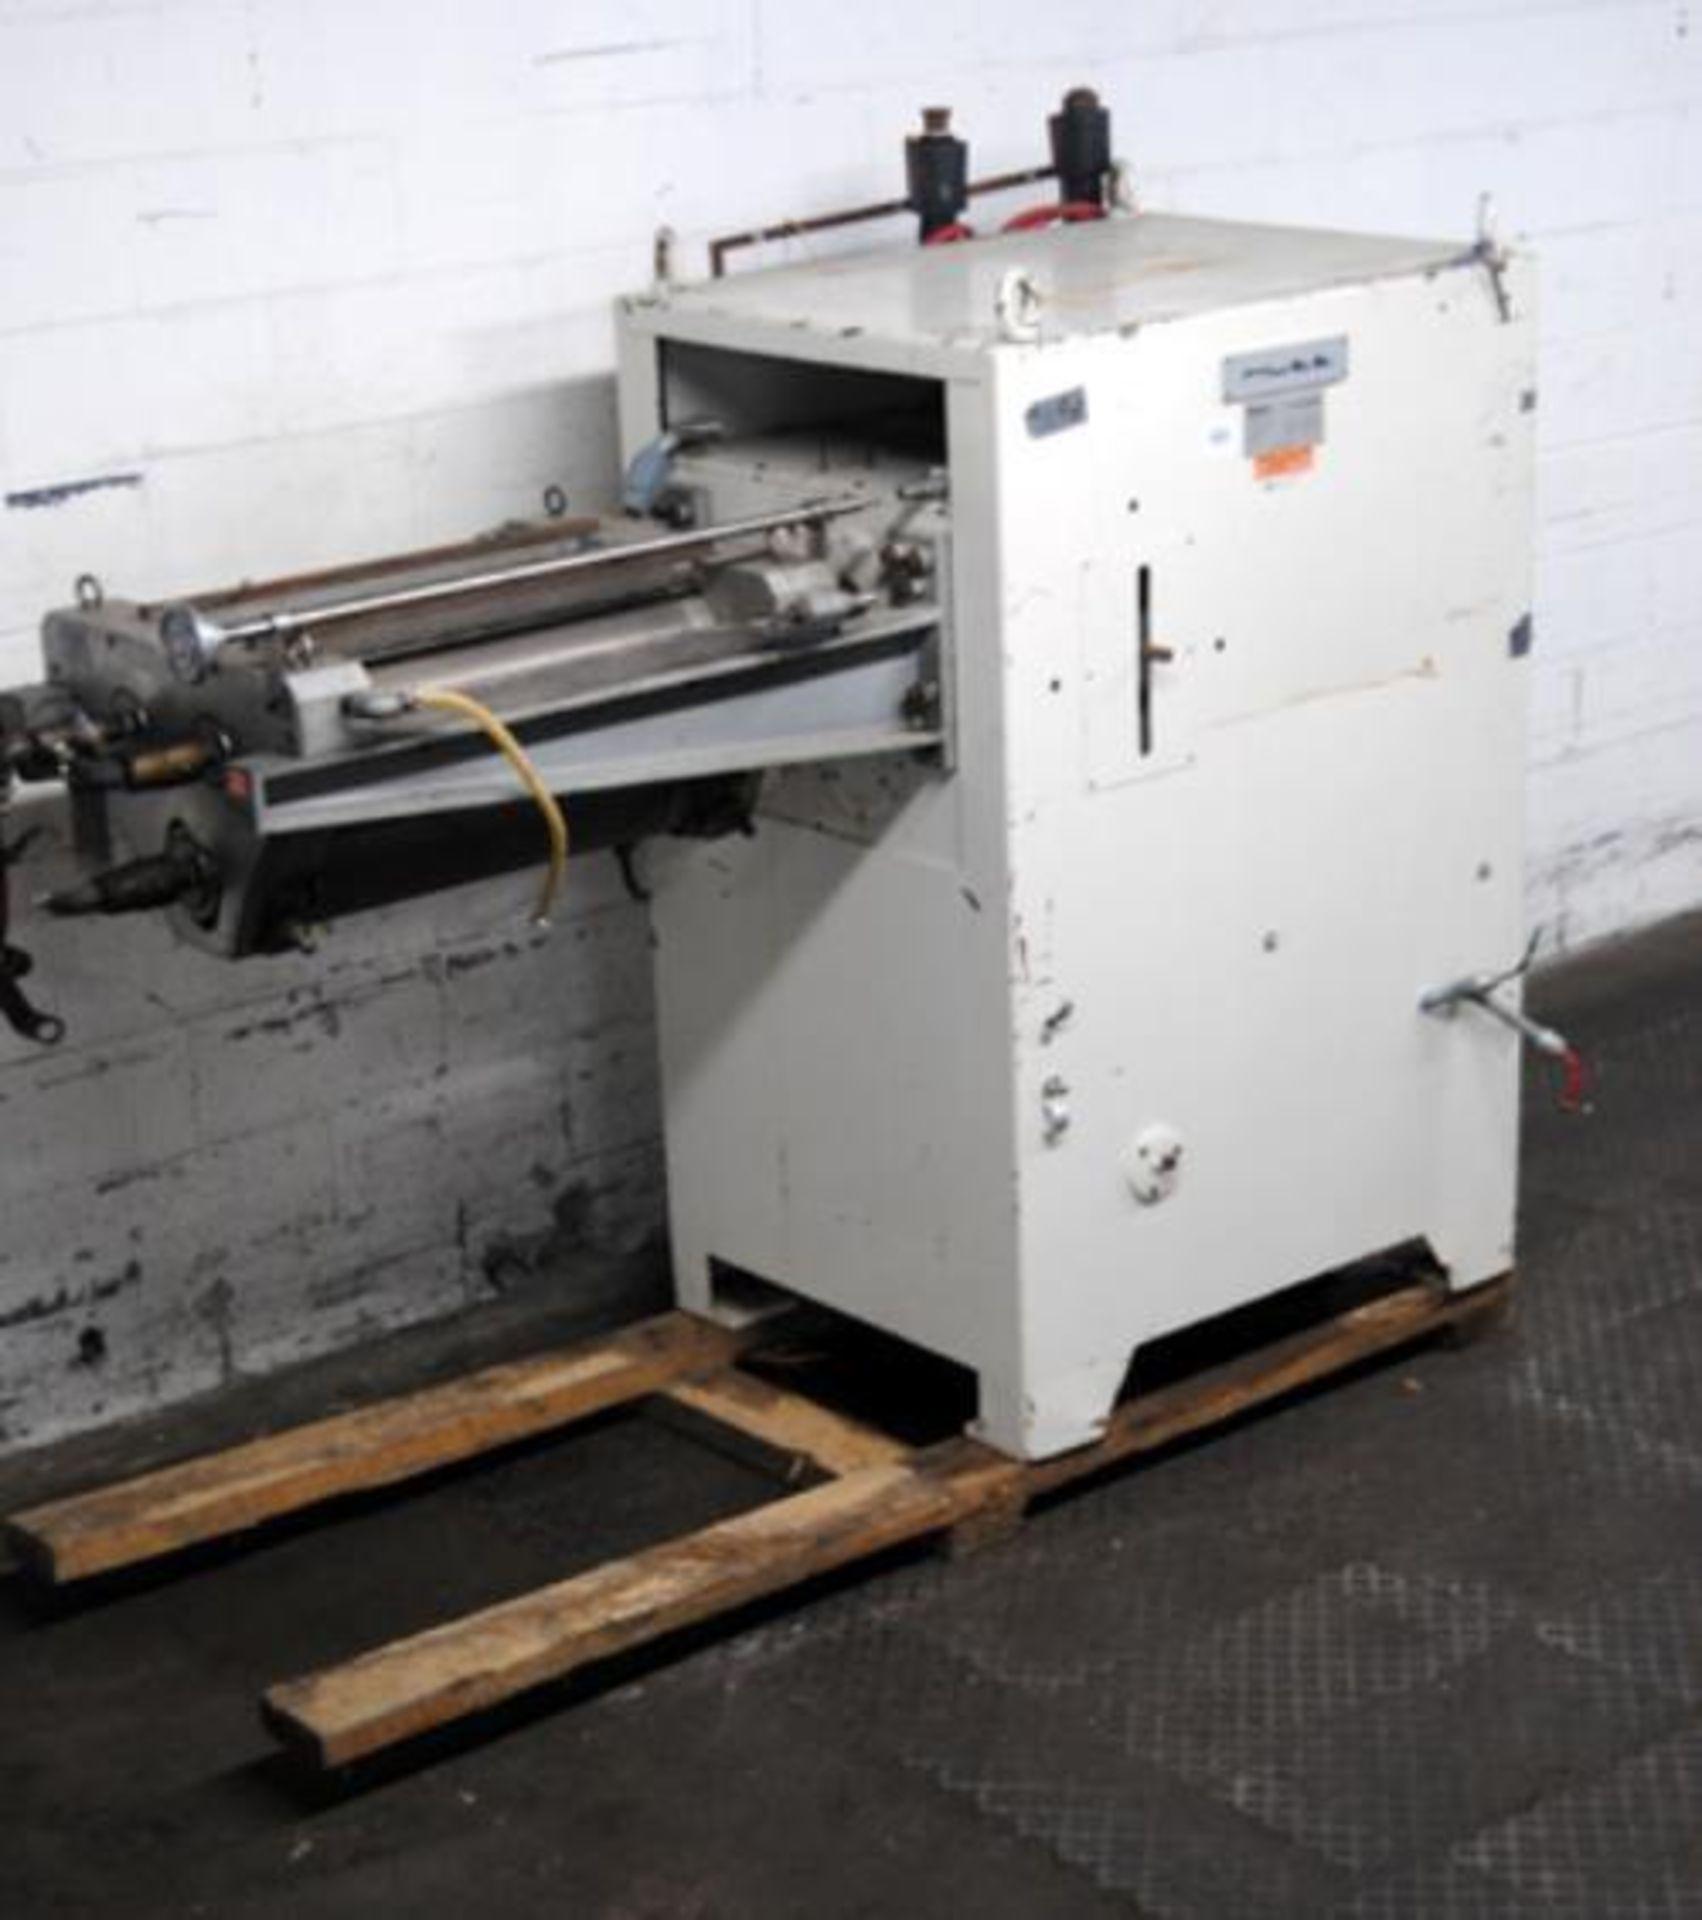 Tecmaq 290 mm Wide Slab Forming Line - Model TM-6H built 2012 - Three sets of gauging/sheeting - Image 27 of 30